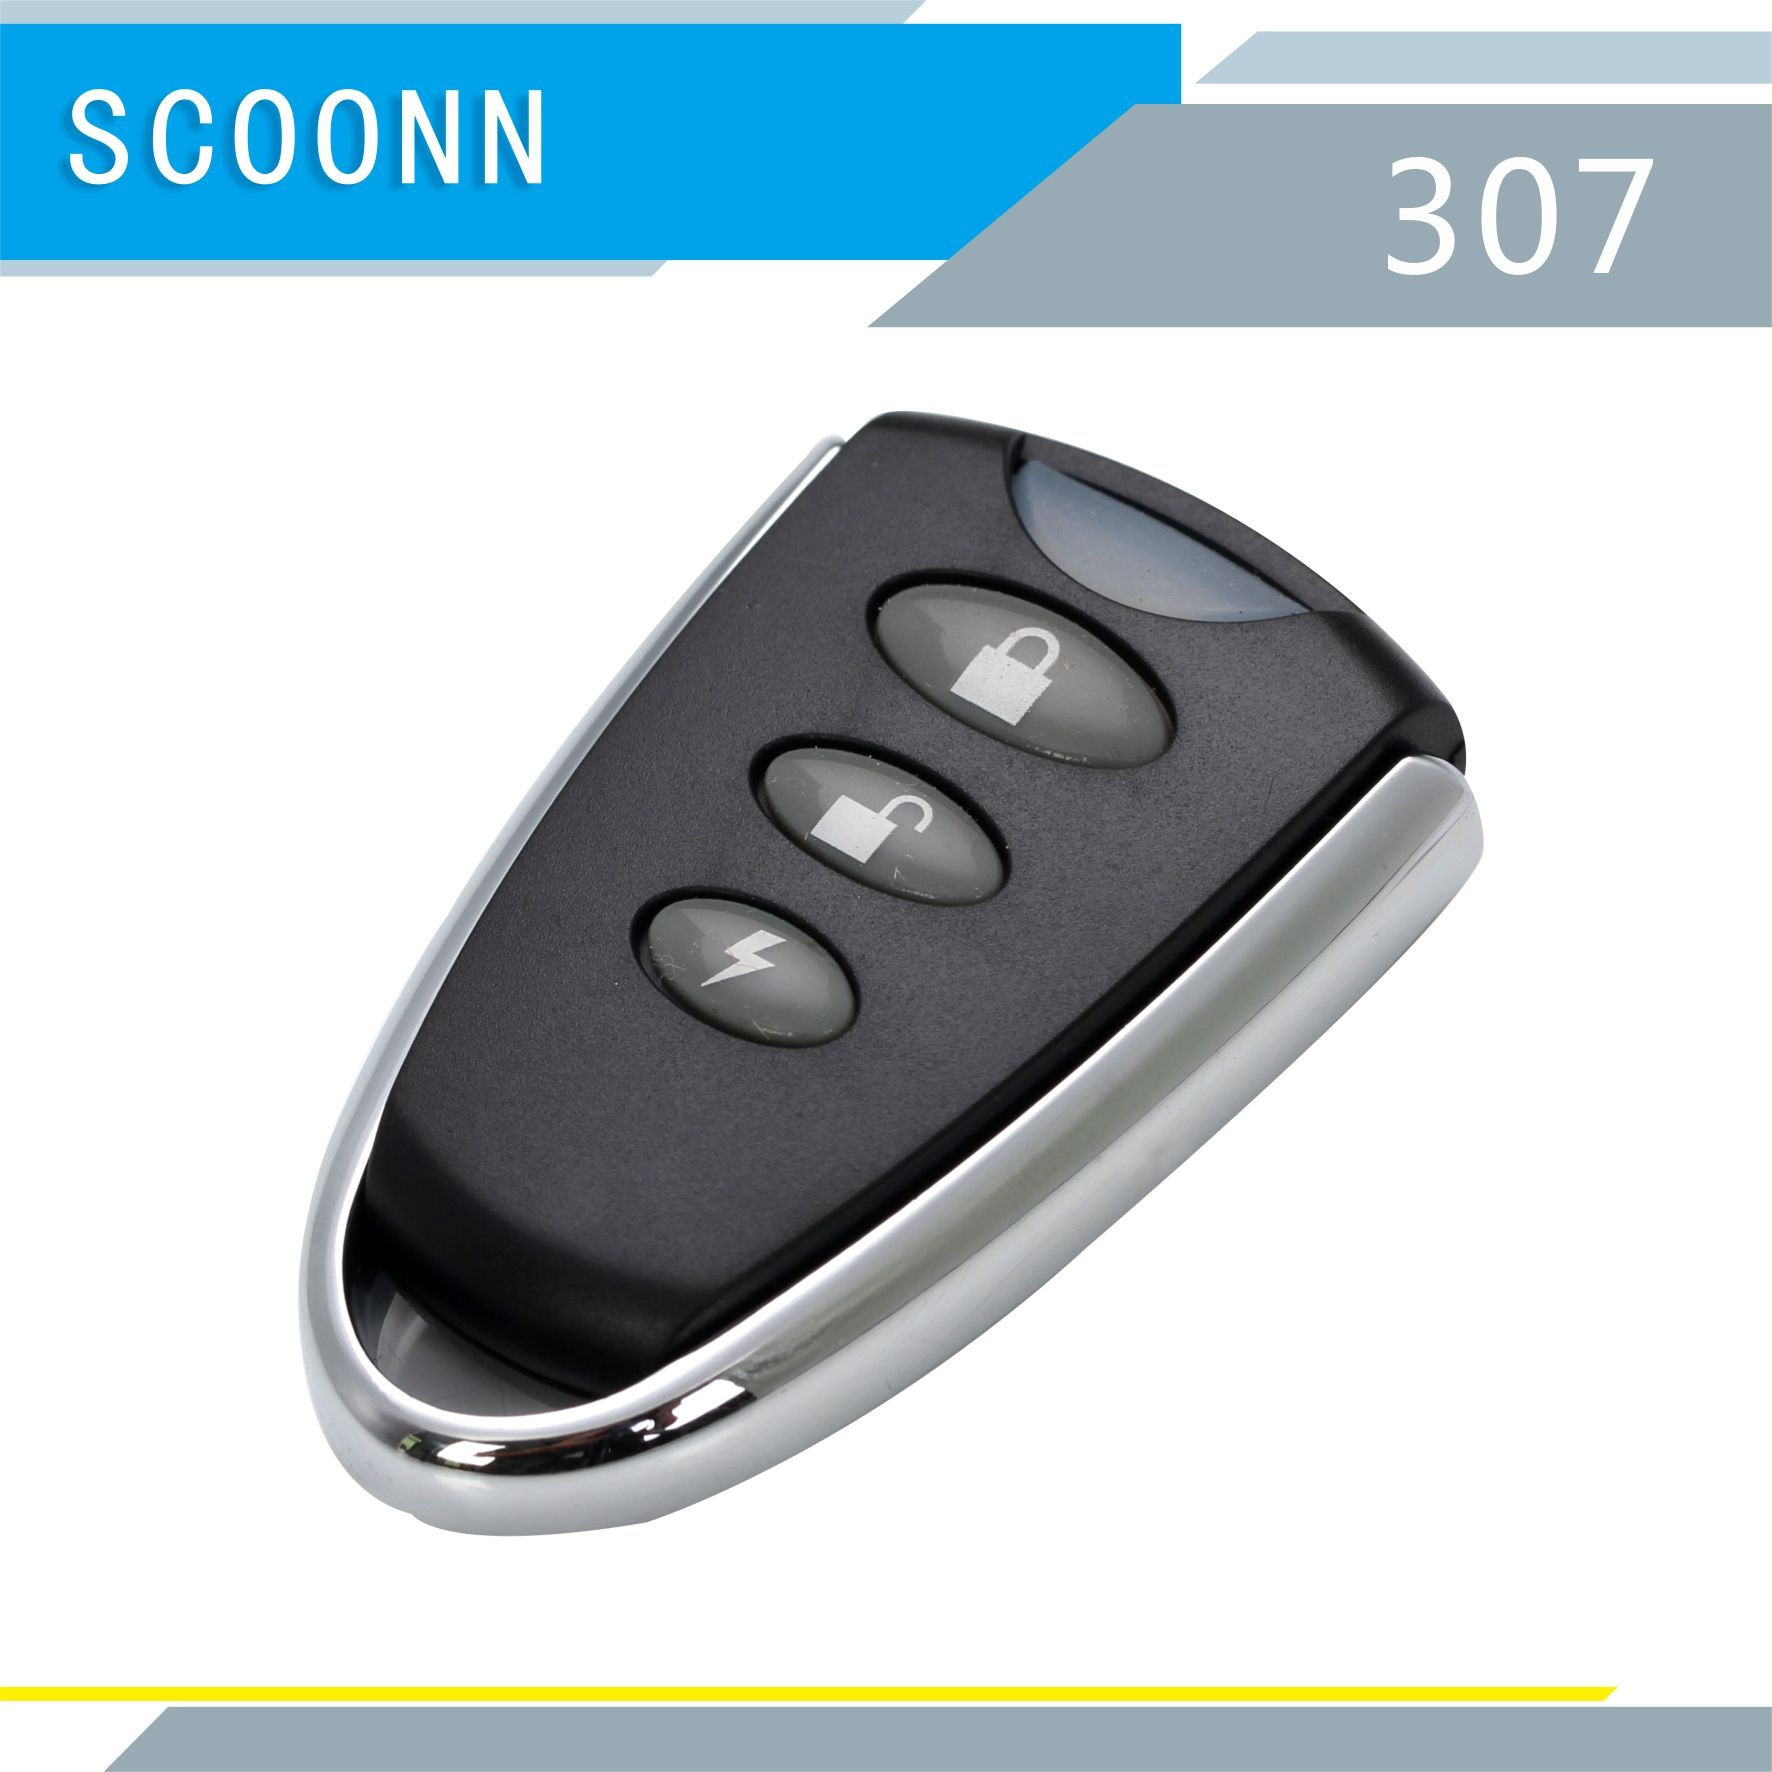 Free Shipping Remote Control Duplicator Code Grabber 433mhz Garage Door Opener Gate Universal 433 Mhz Remote Control Ev1527 Key In 2020 Key Programmer Remote Key Fob